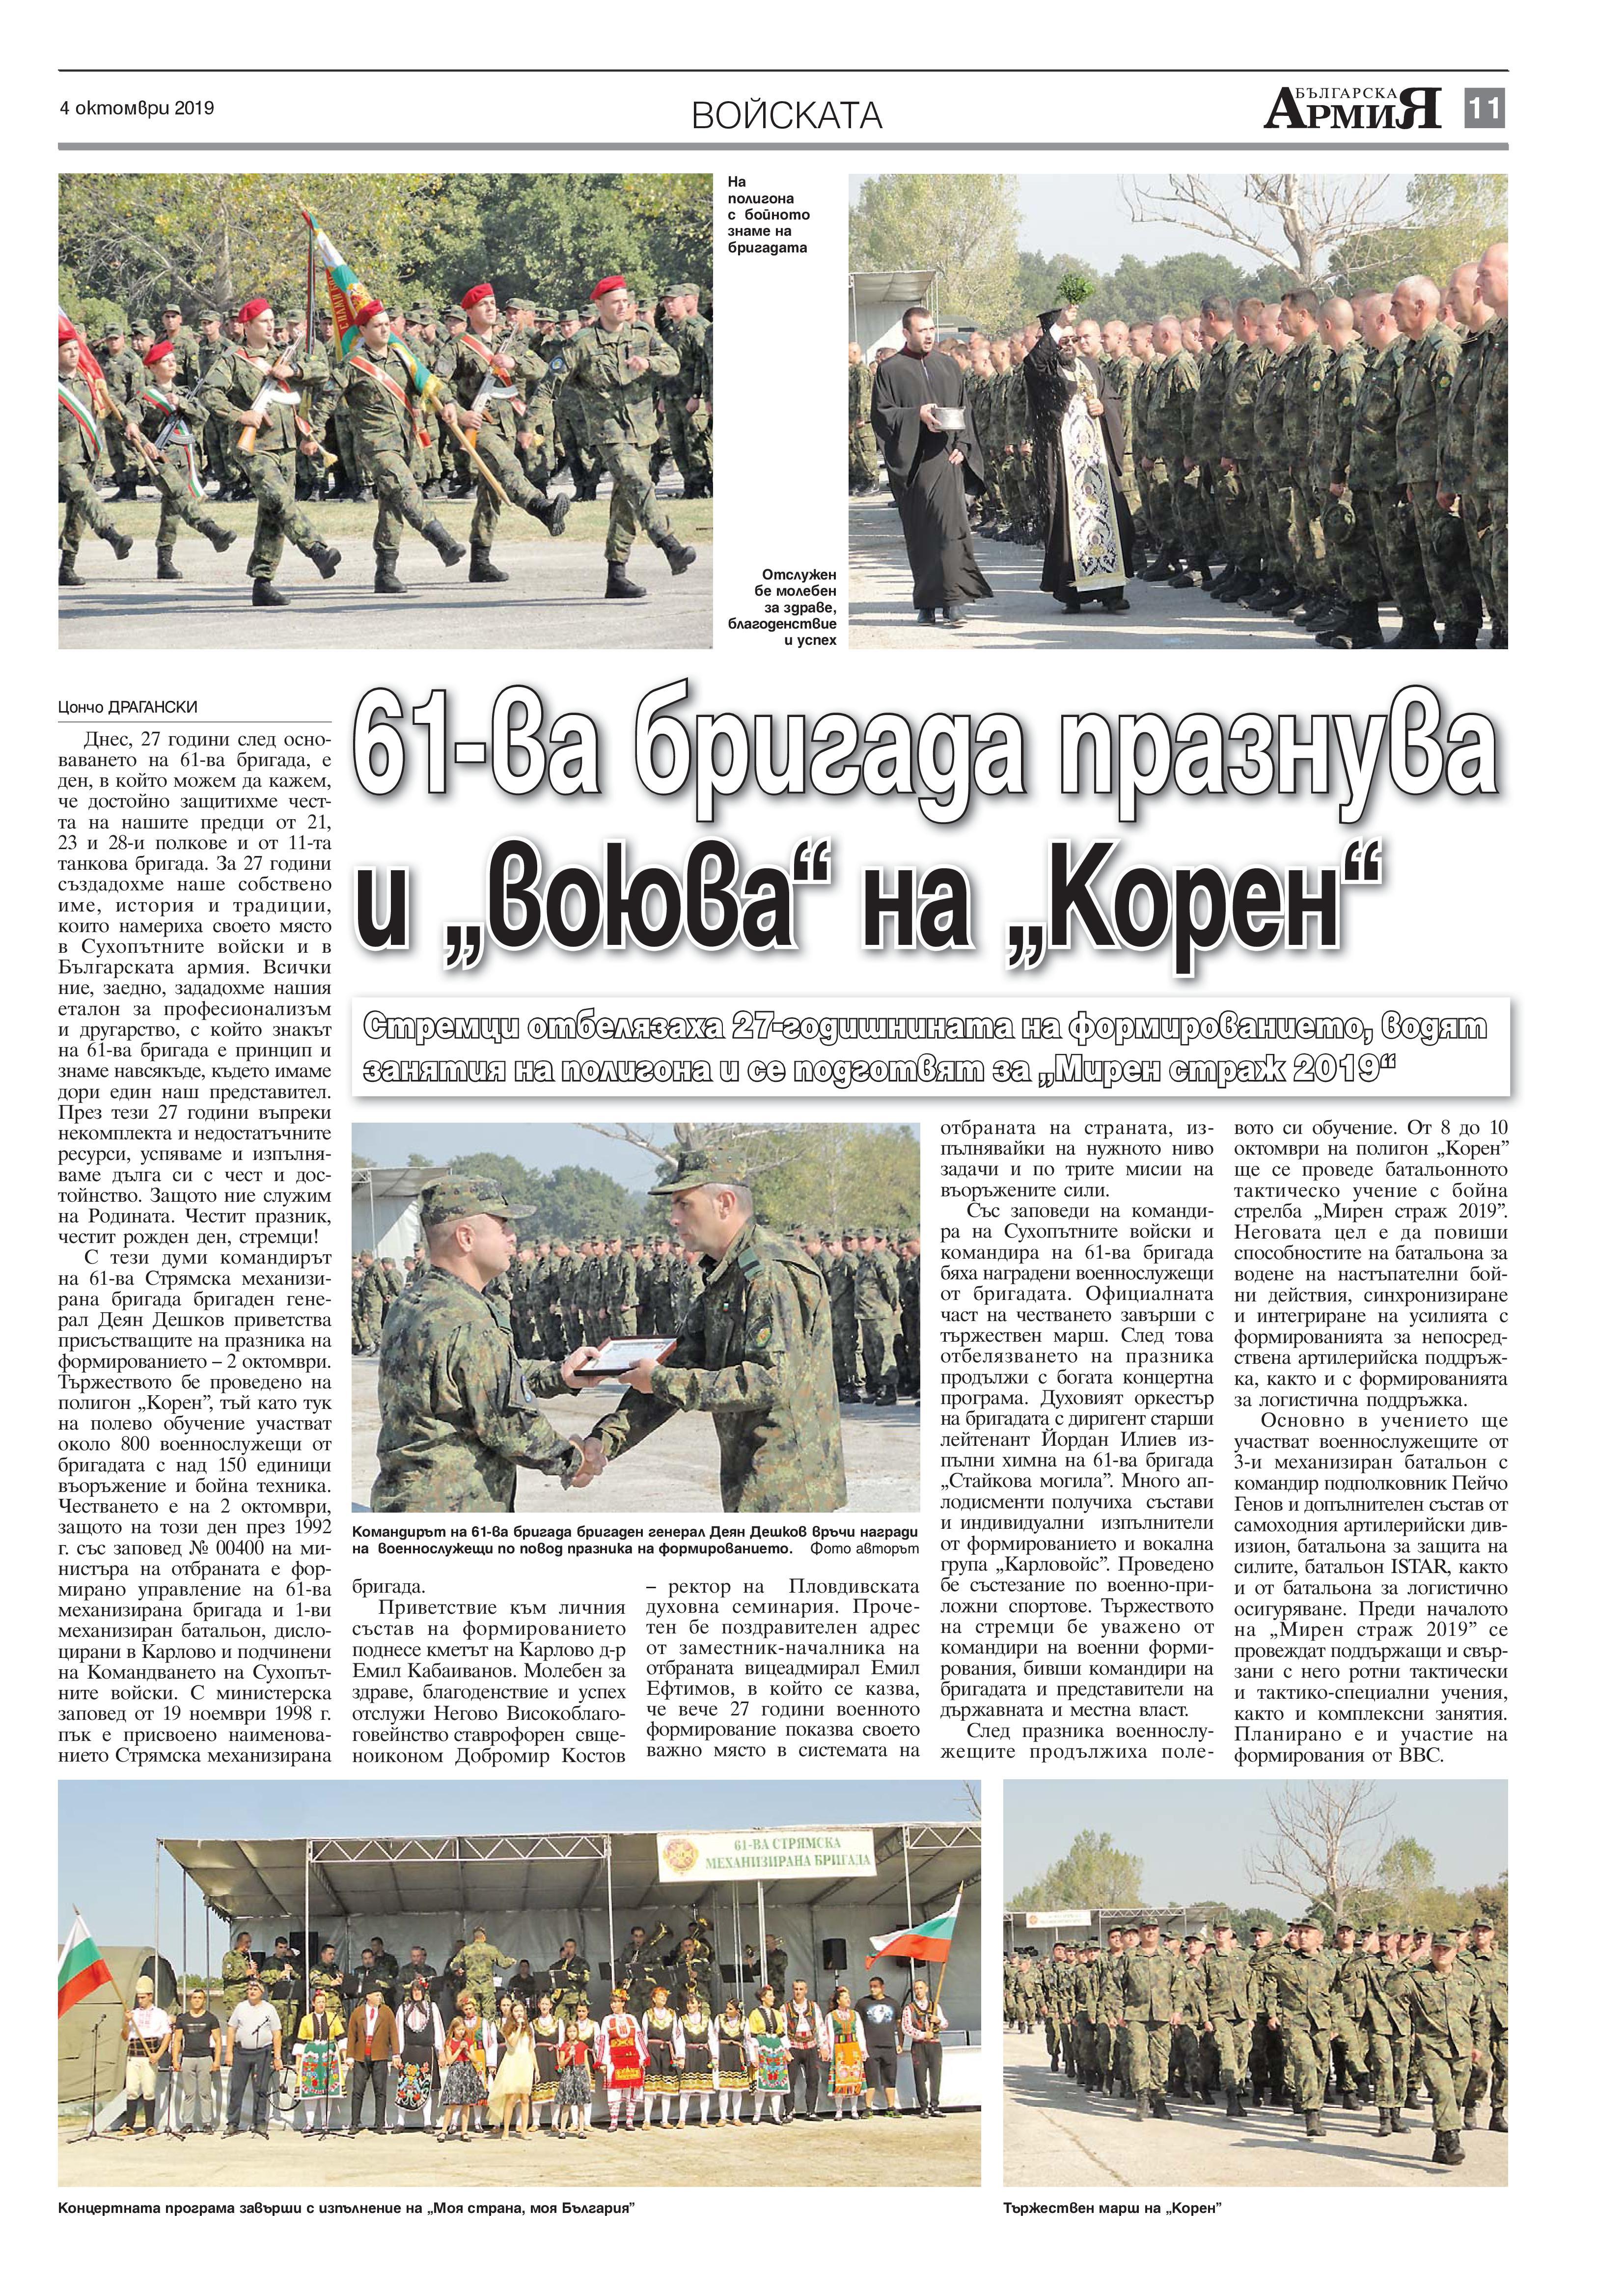 https://www.armymedia.bg/wp-content/uploads/2015/06/11-33.jpg